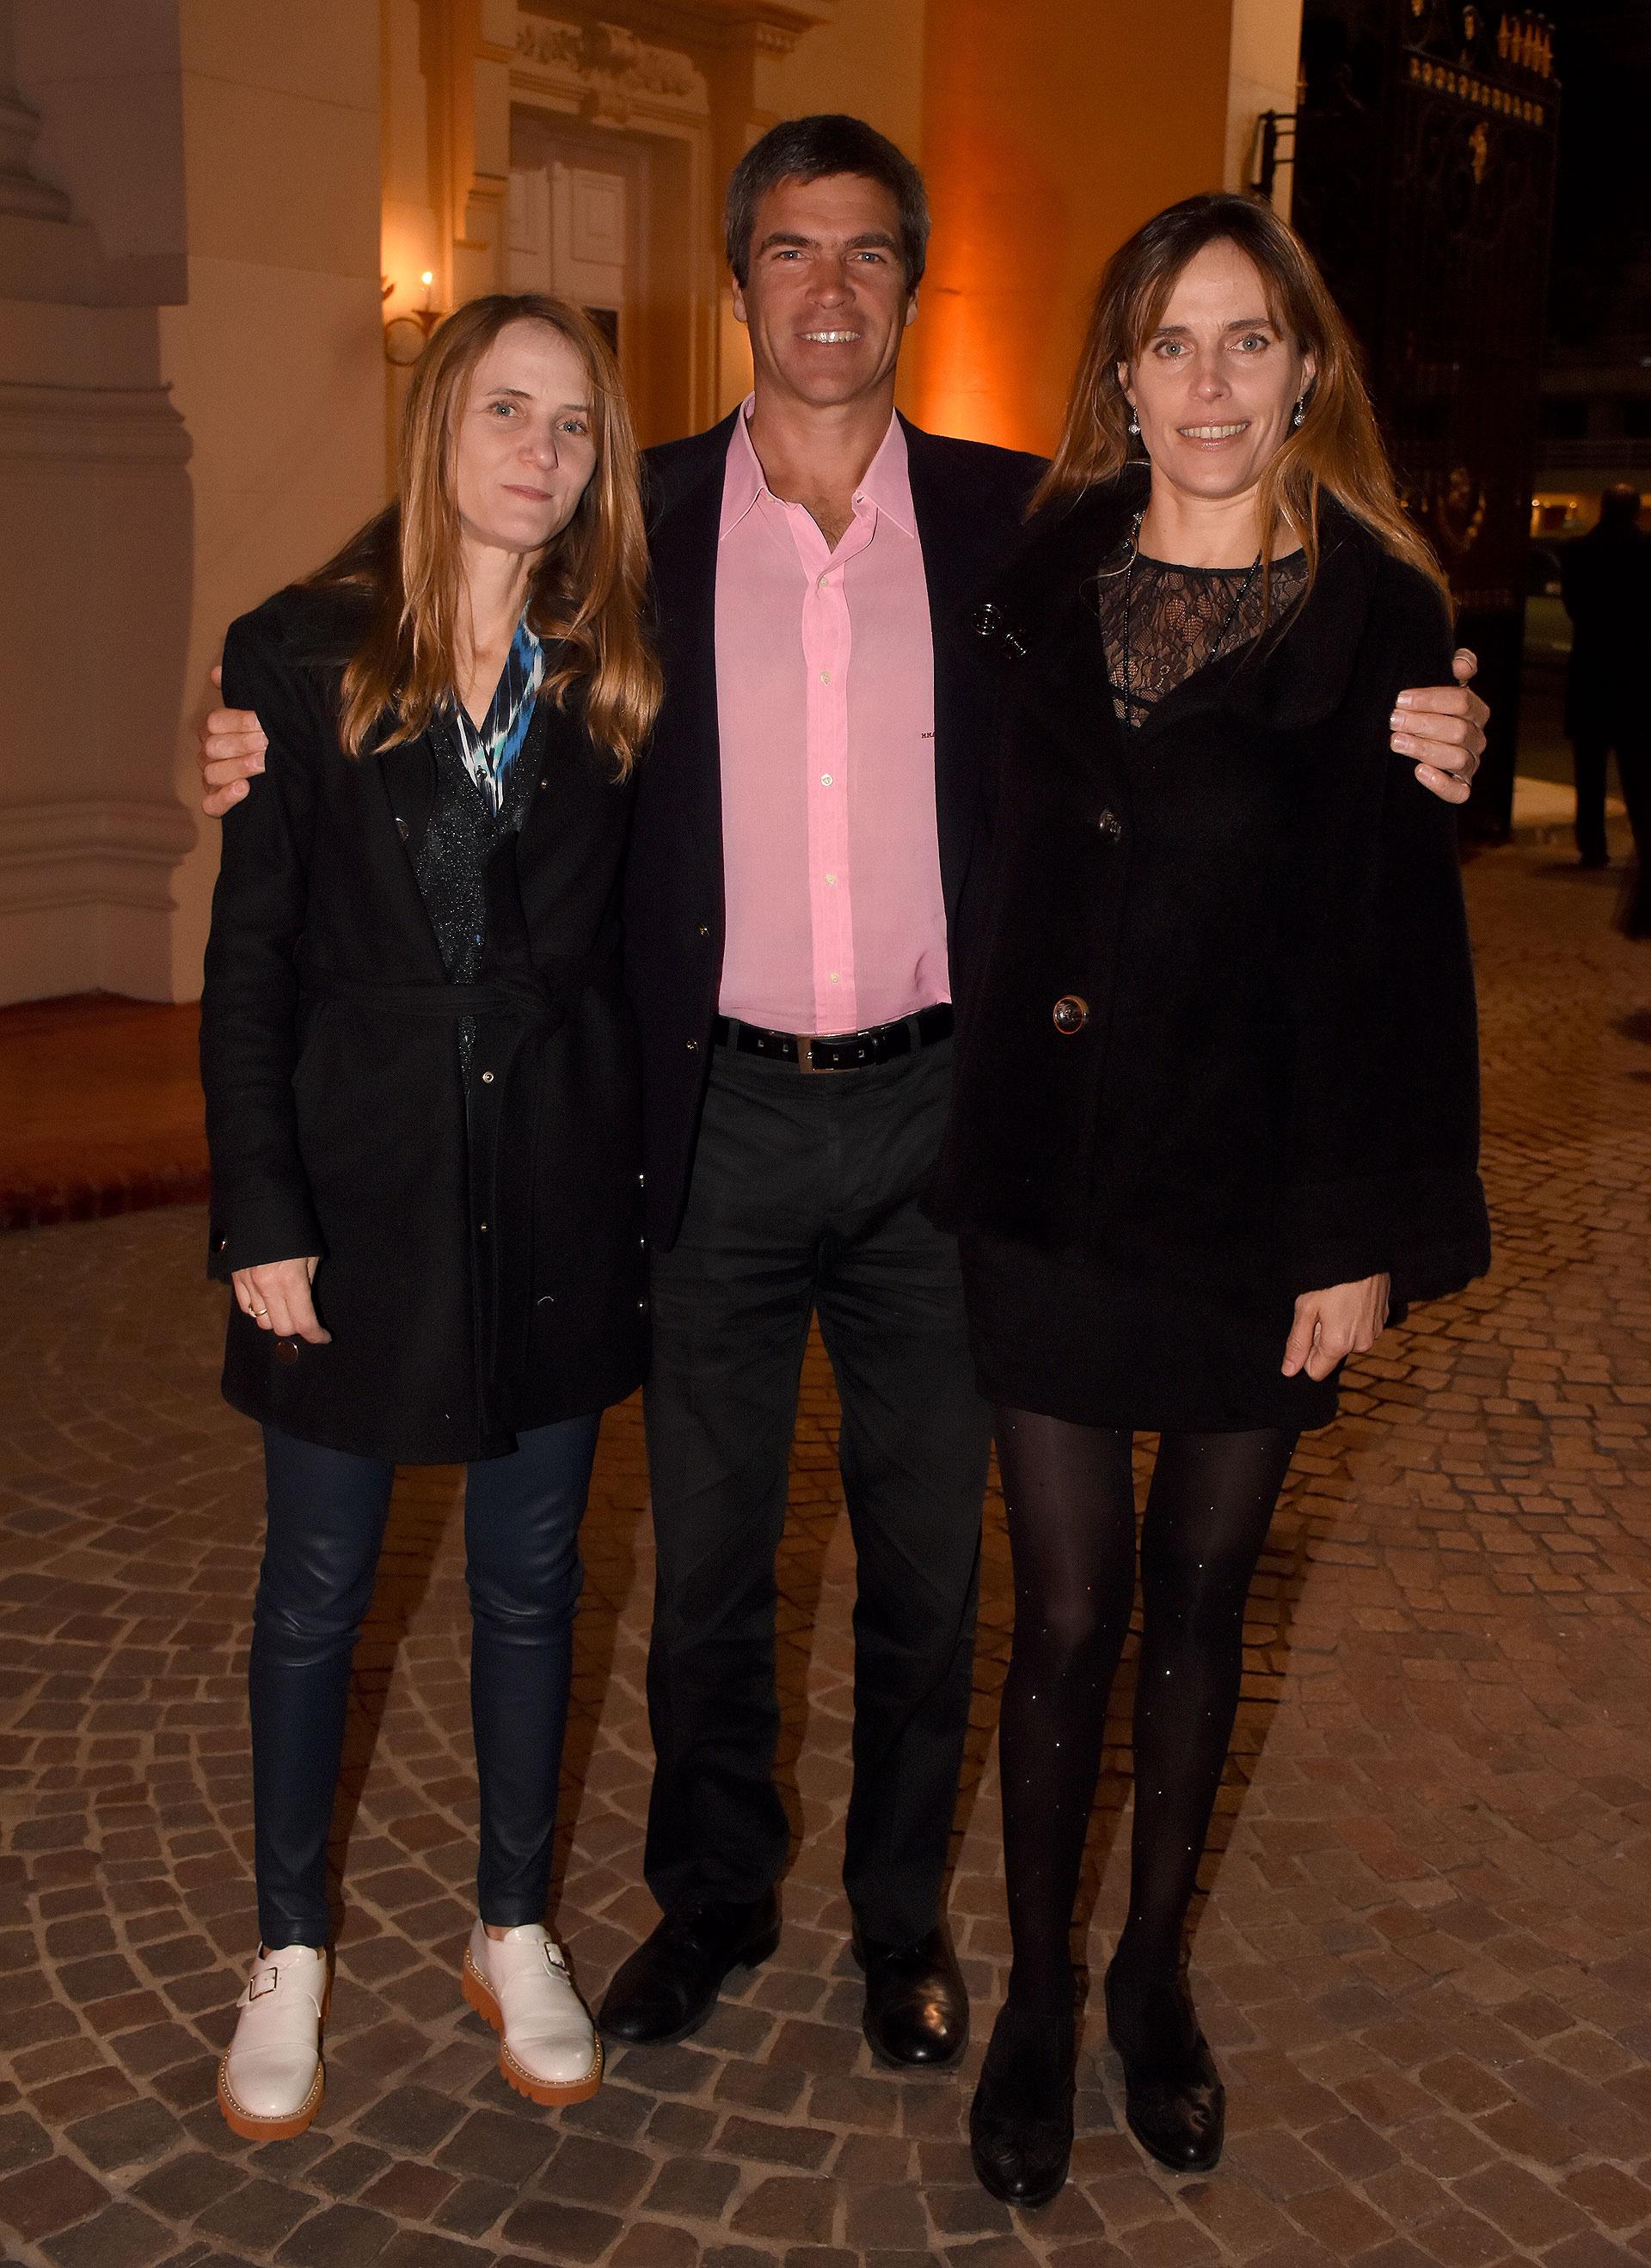 Agustina Lanusse, Hernán Agote y Lucía Vaca Vergara